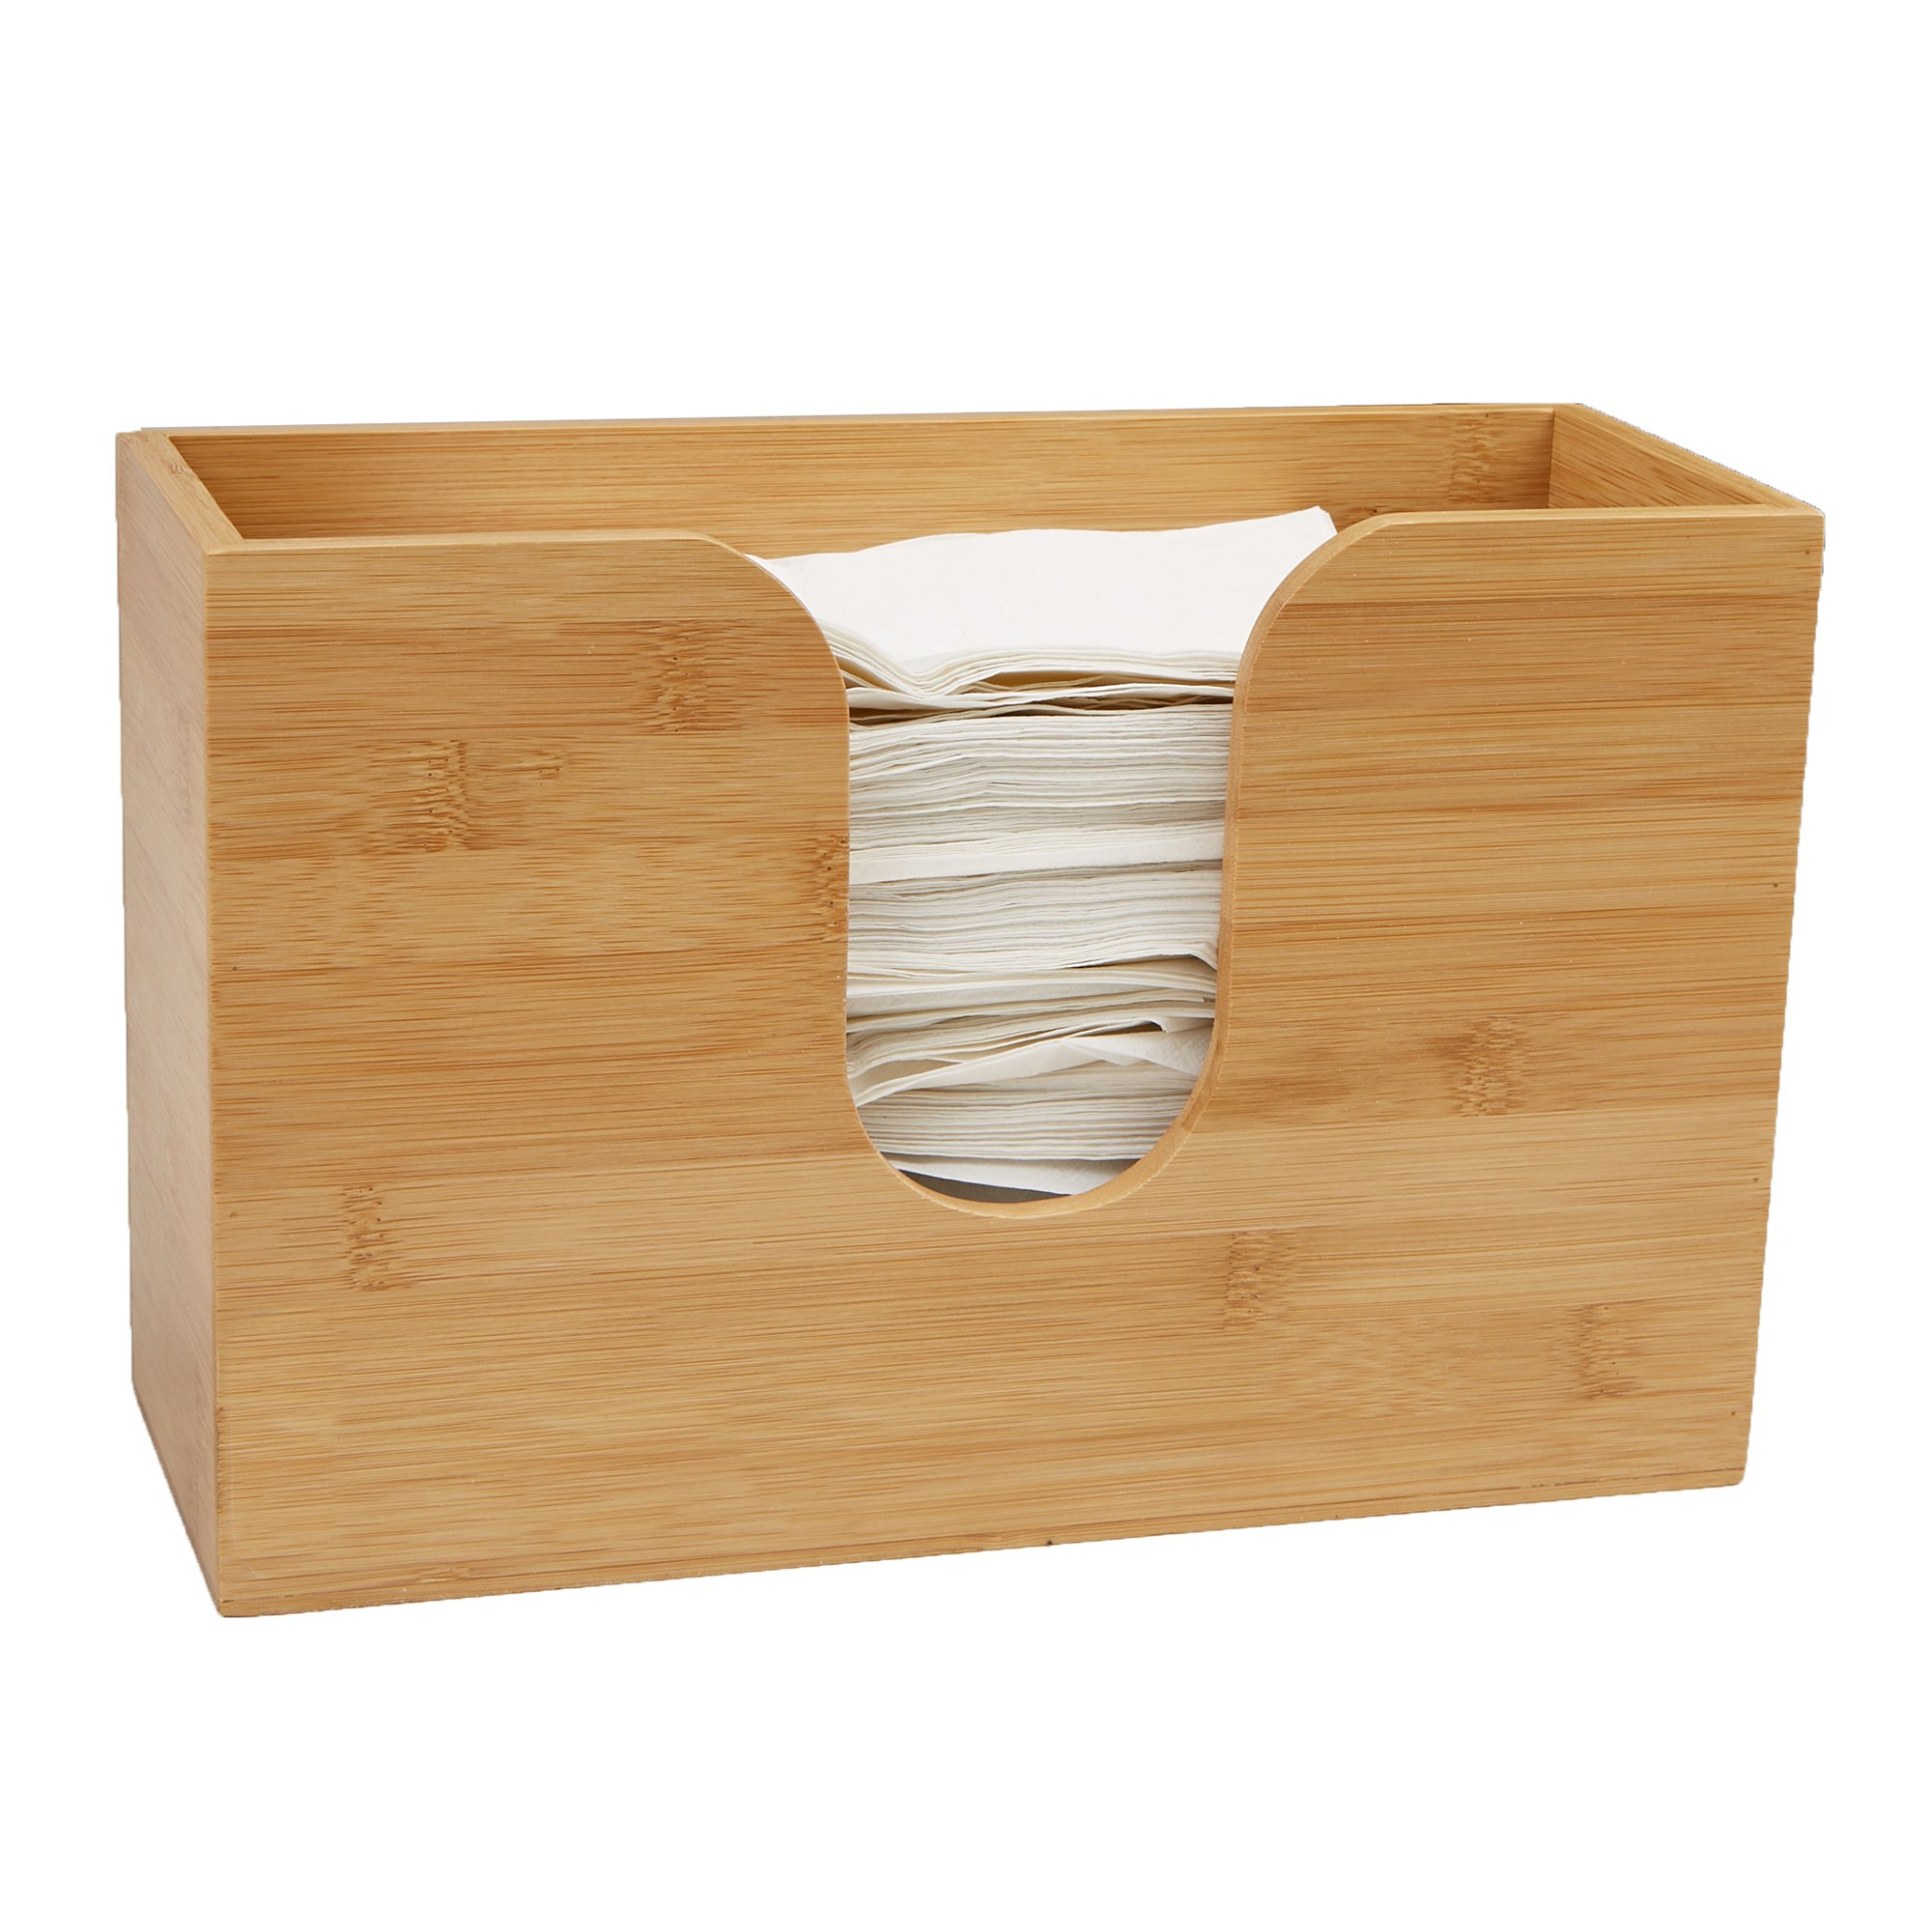 Mind Reader Bamboo Wall Mount Interfold Napkin Dispenser Organizer, Brown by Mind Reader (Image #3)